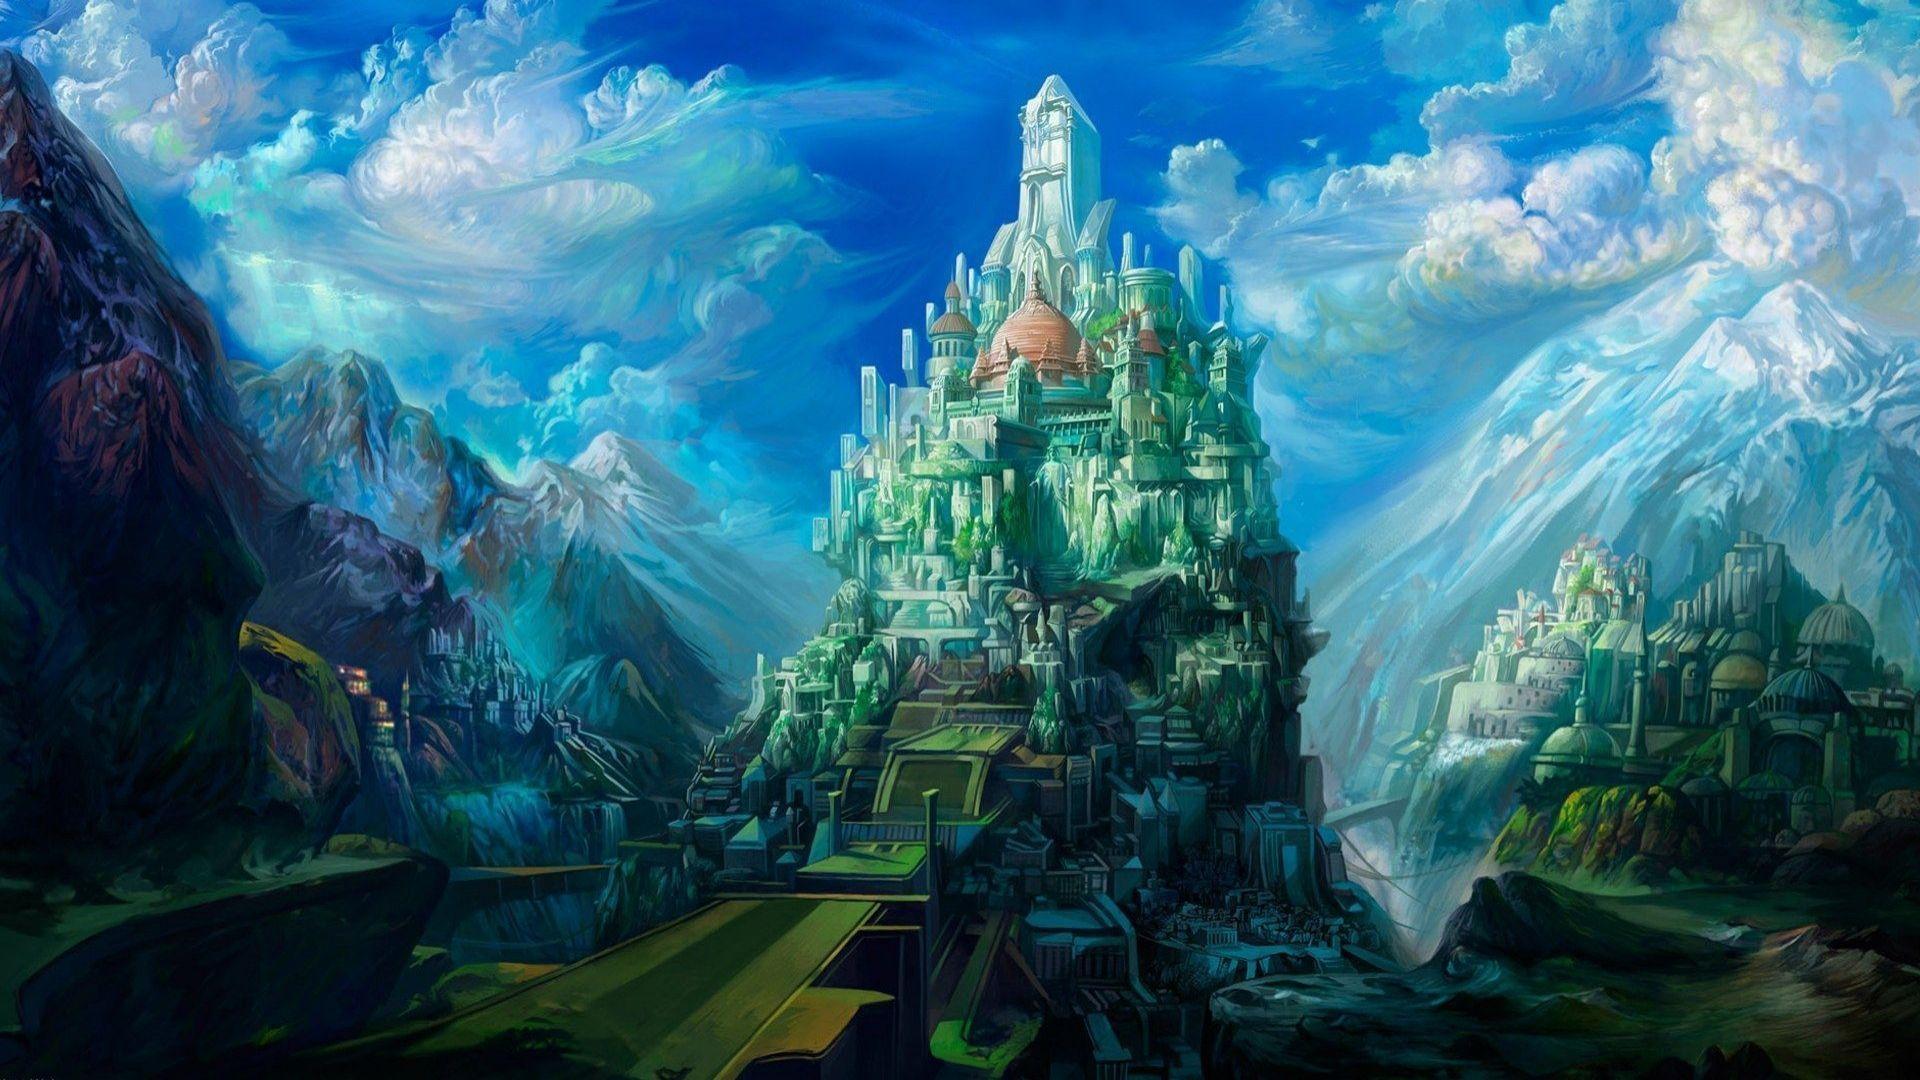 magic castle fantasy world - photo #22